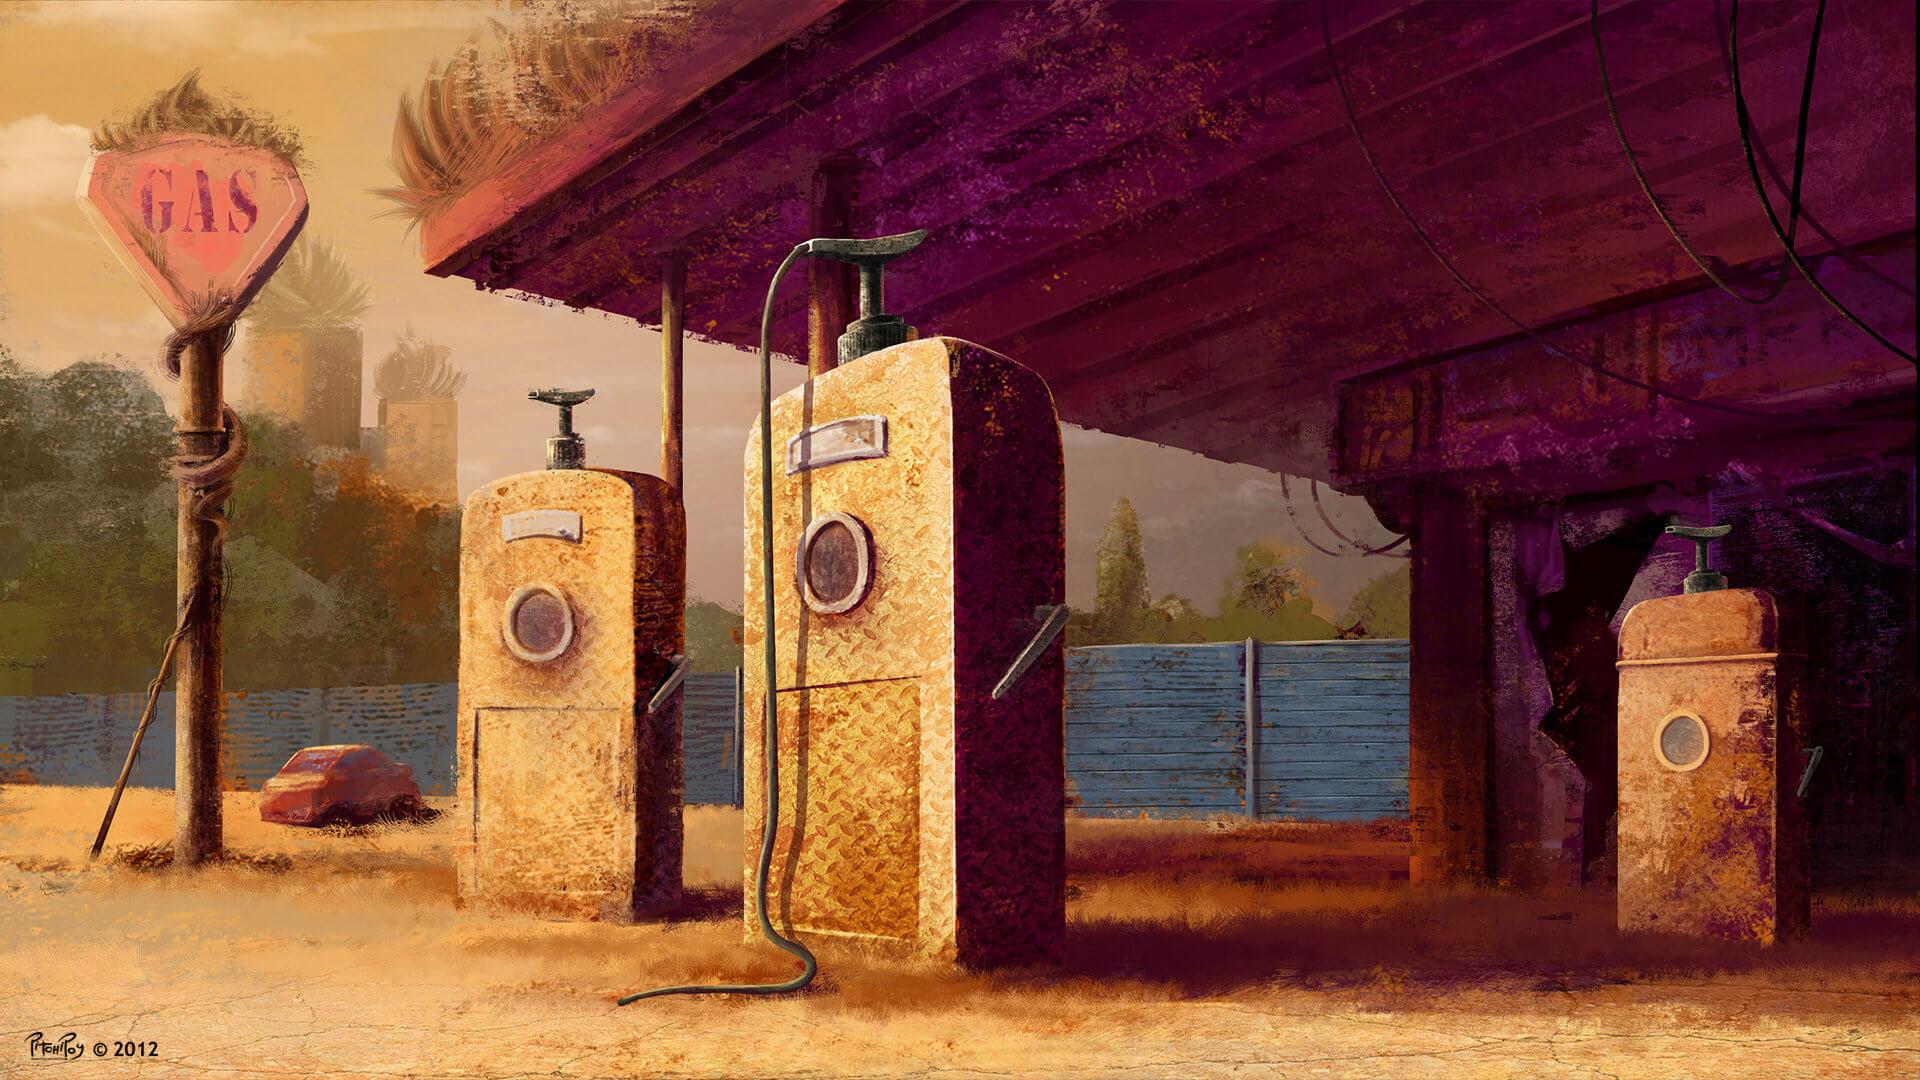 Gasstation_dusk_med_MS